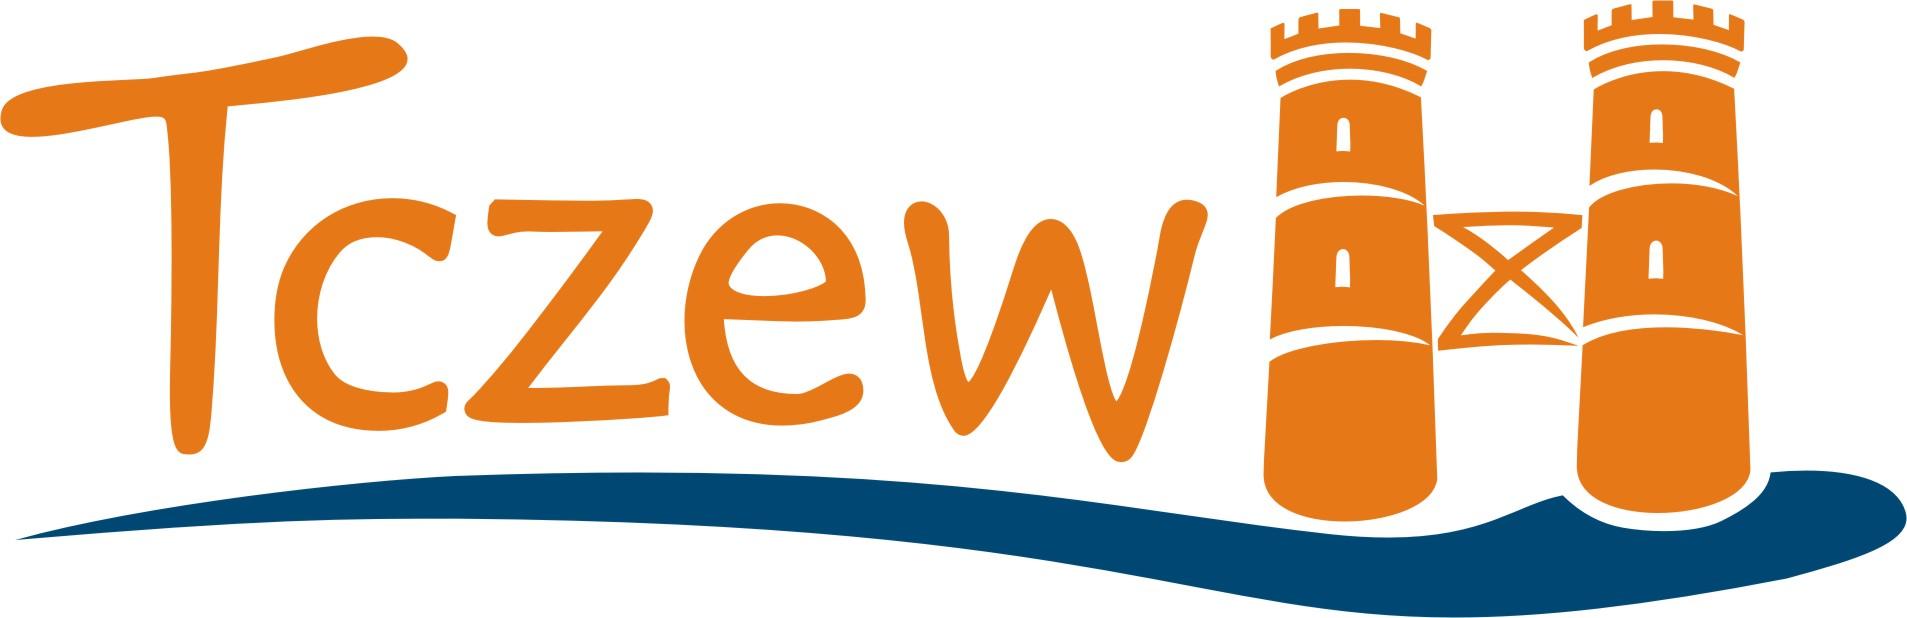 Logo Miasta Tczewa